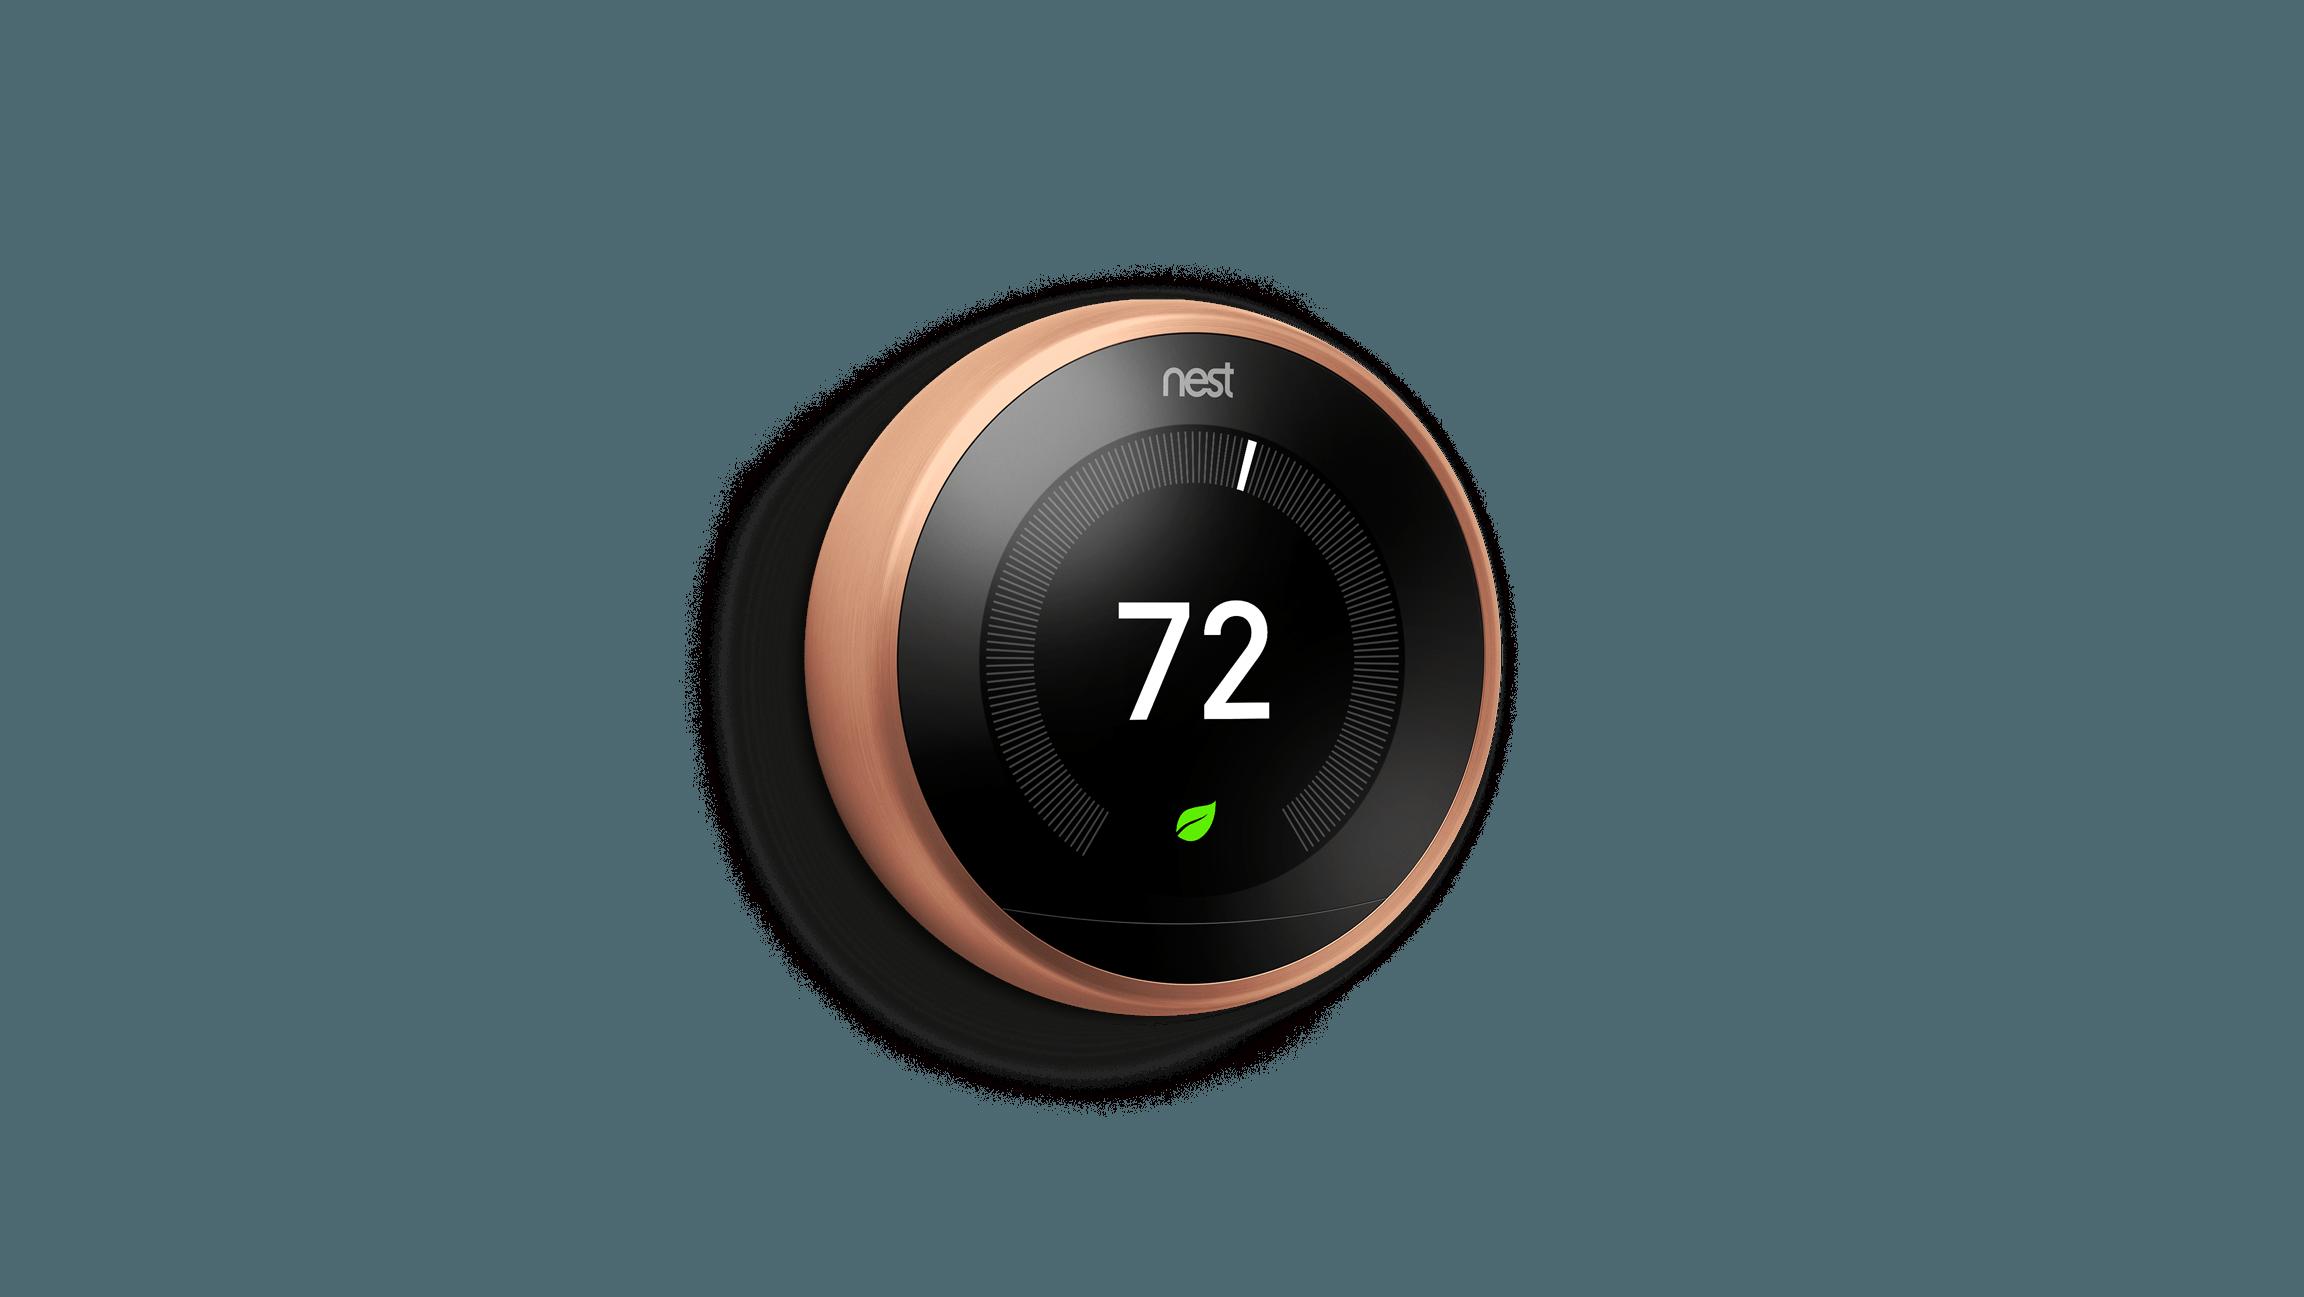 nest 3rd homekit yamaha g2 electric wiring diagram buy thermostat toronto best prices